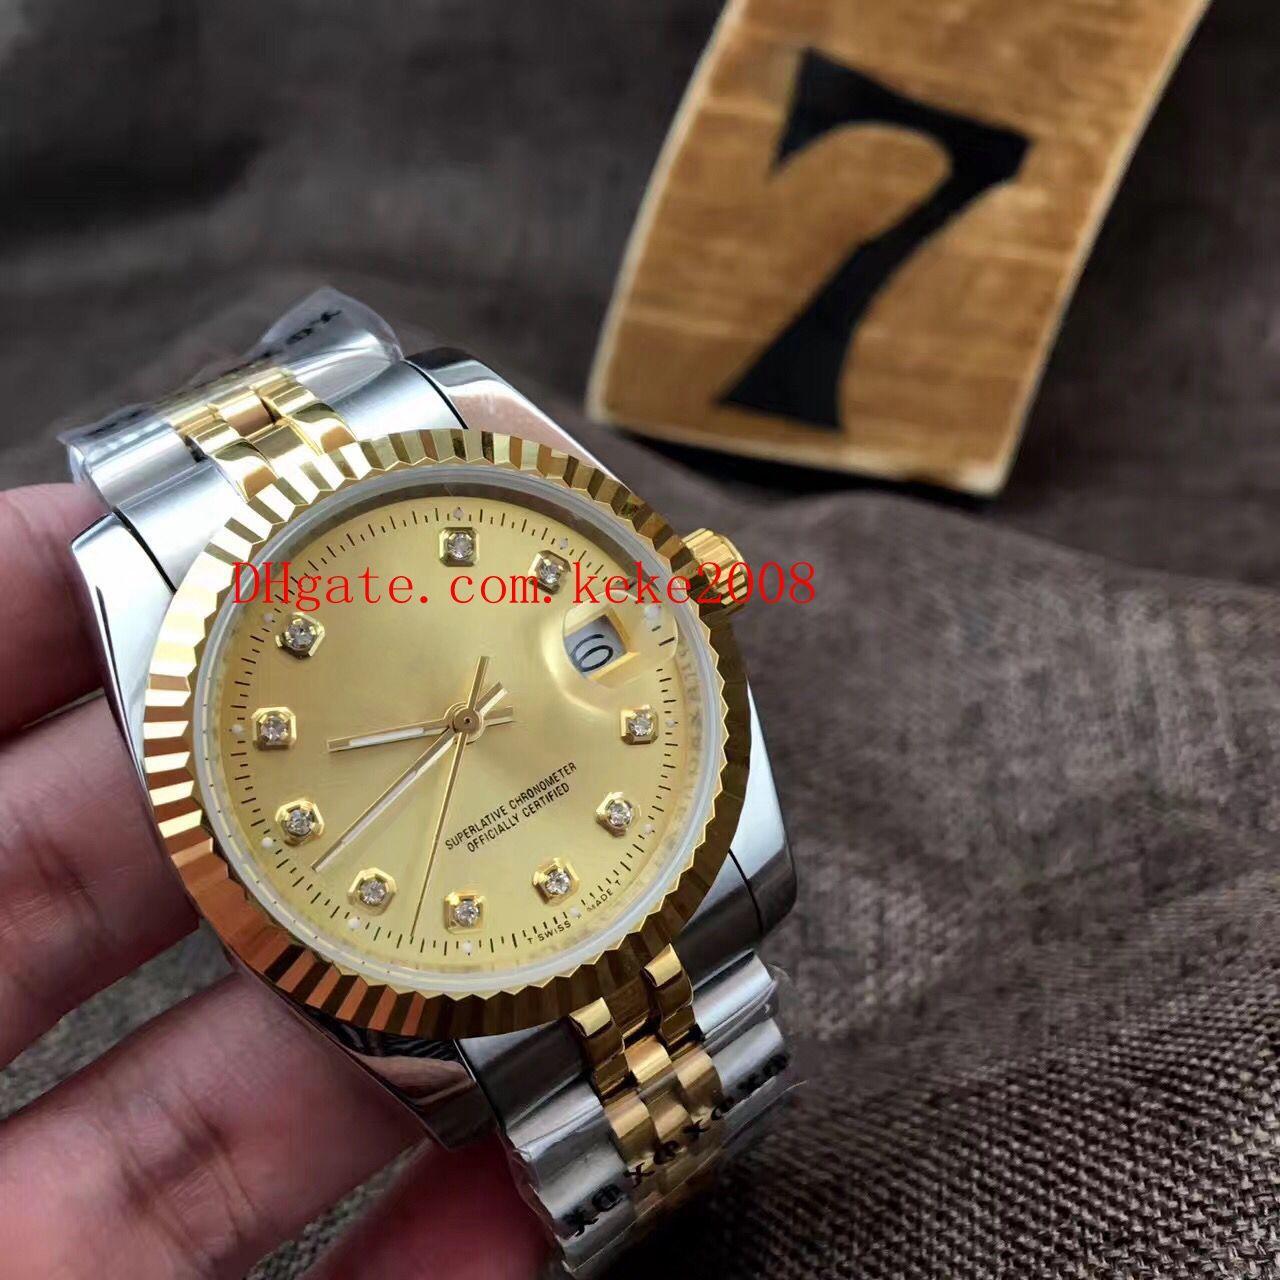 Relógio de luxo 36 milímetros 41 milímetros Datejust 116233 Data Presidente ouro 18K Diamond Dial Relógios Asia 2813 Movimento mecânico do homem Automatic